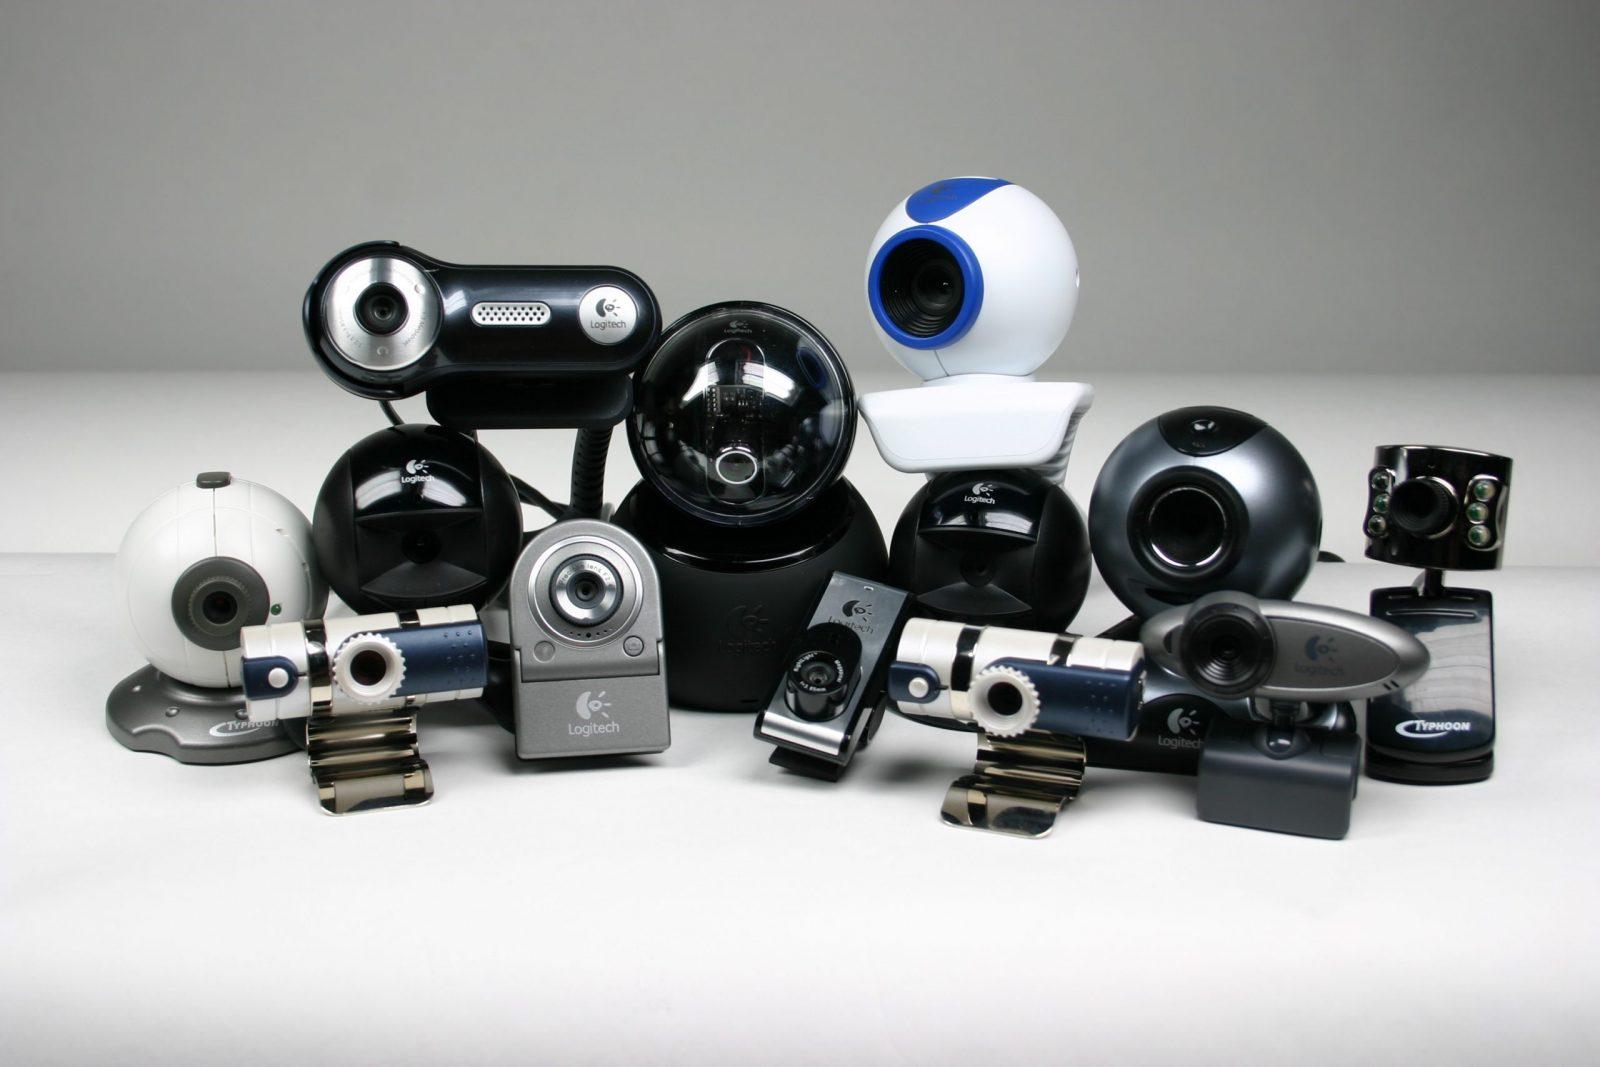 Webcamtect.